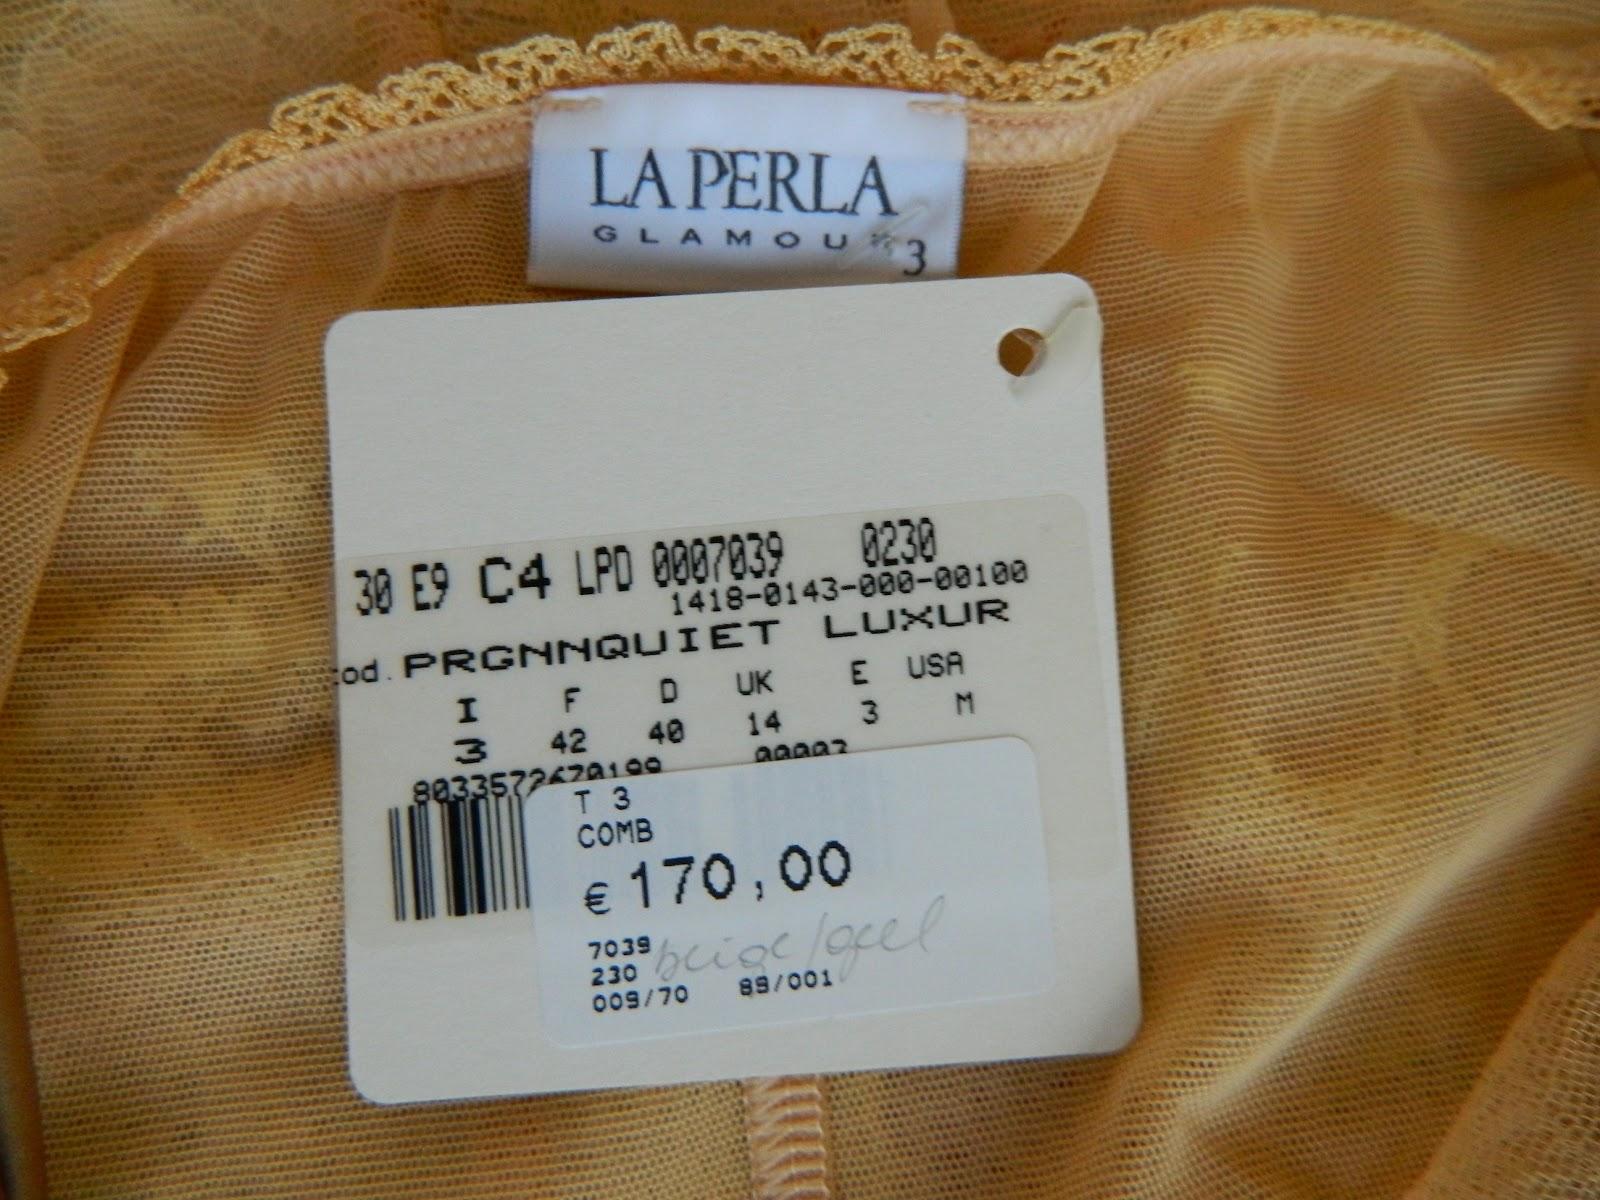 SPOT OUTLET High Fashion Brands wholesale stocklots: LA PERLA ...